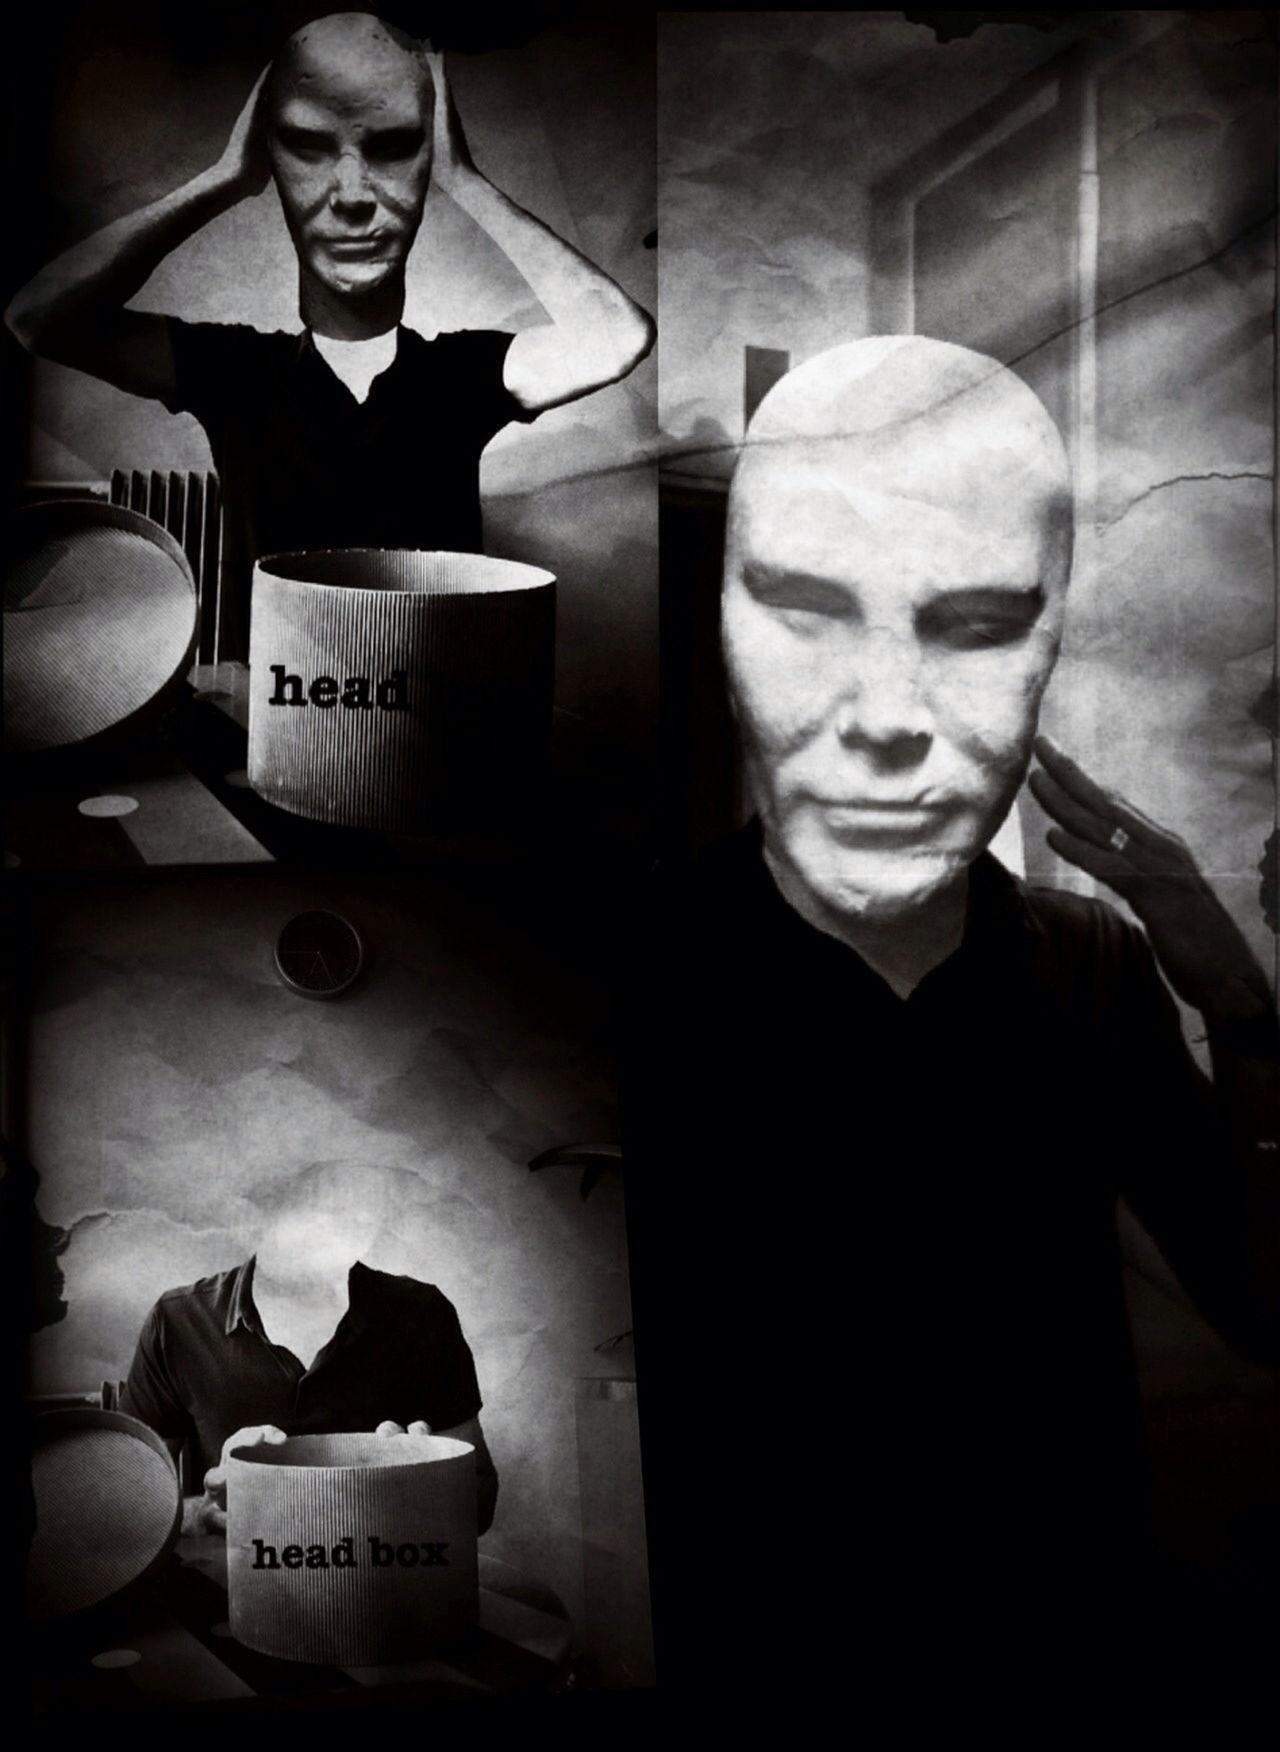 The Headless Man